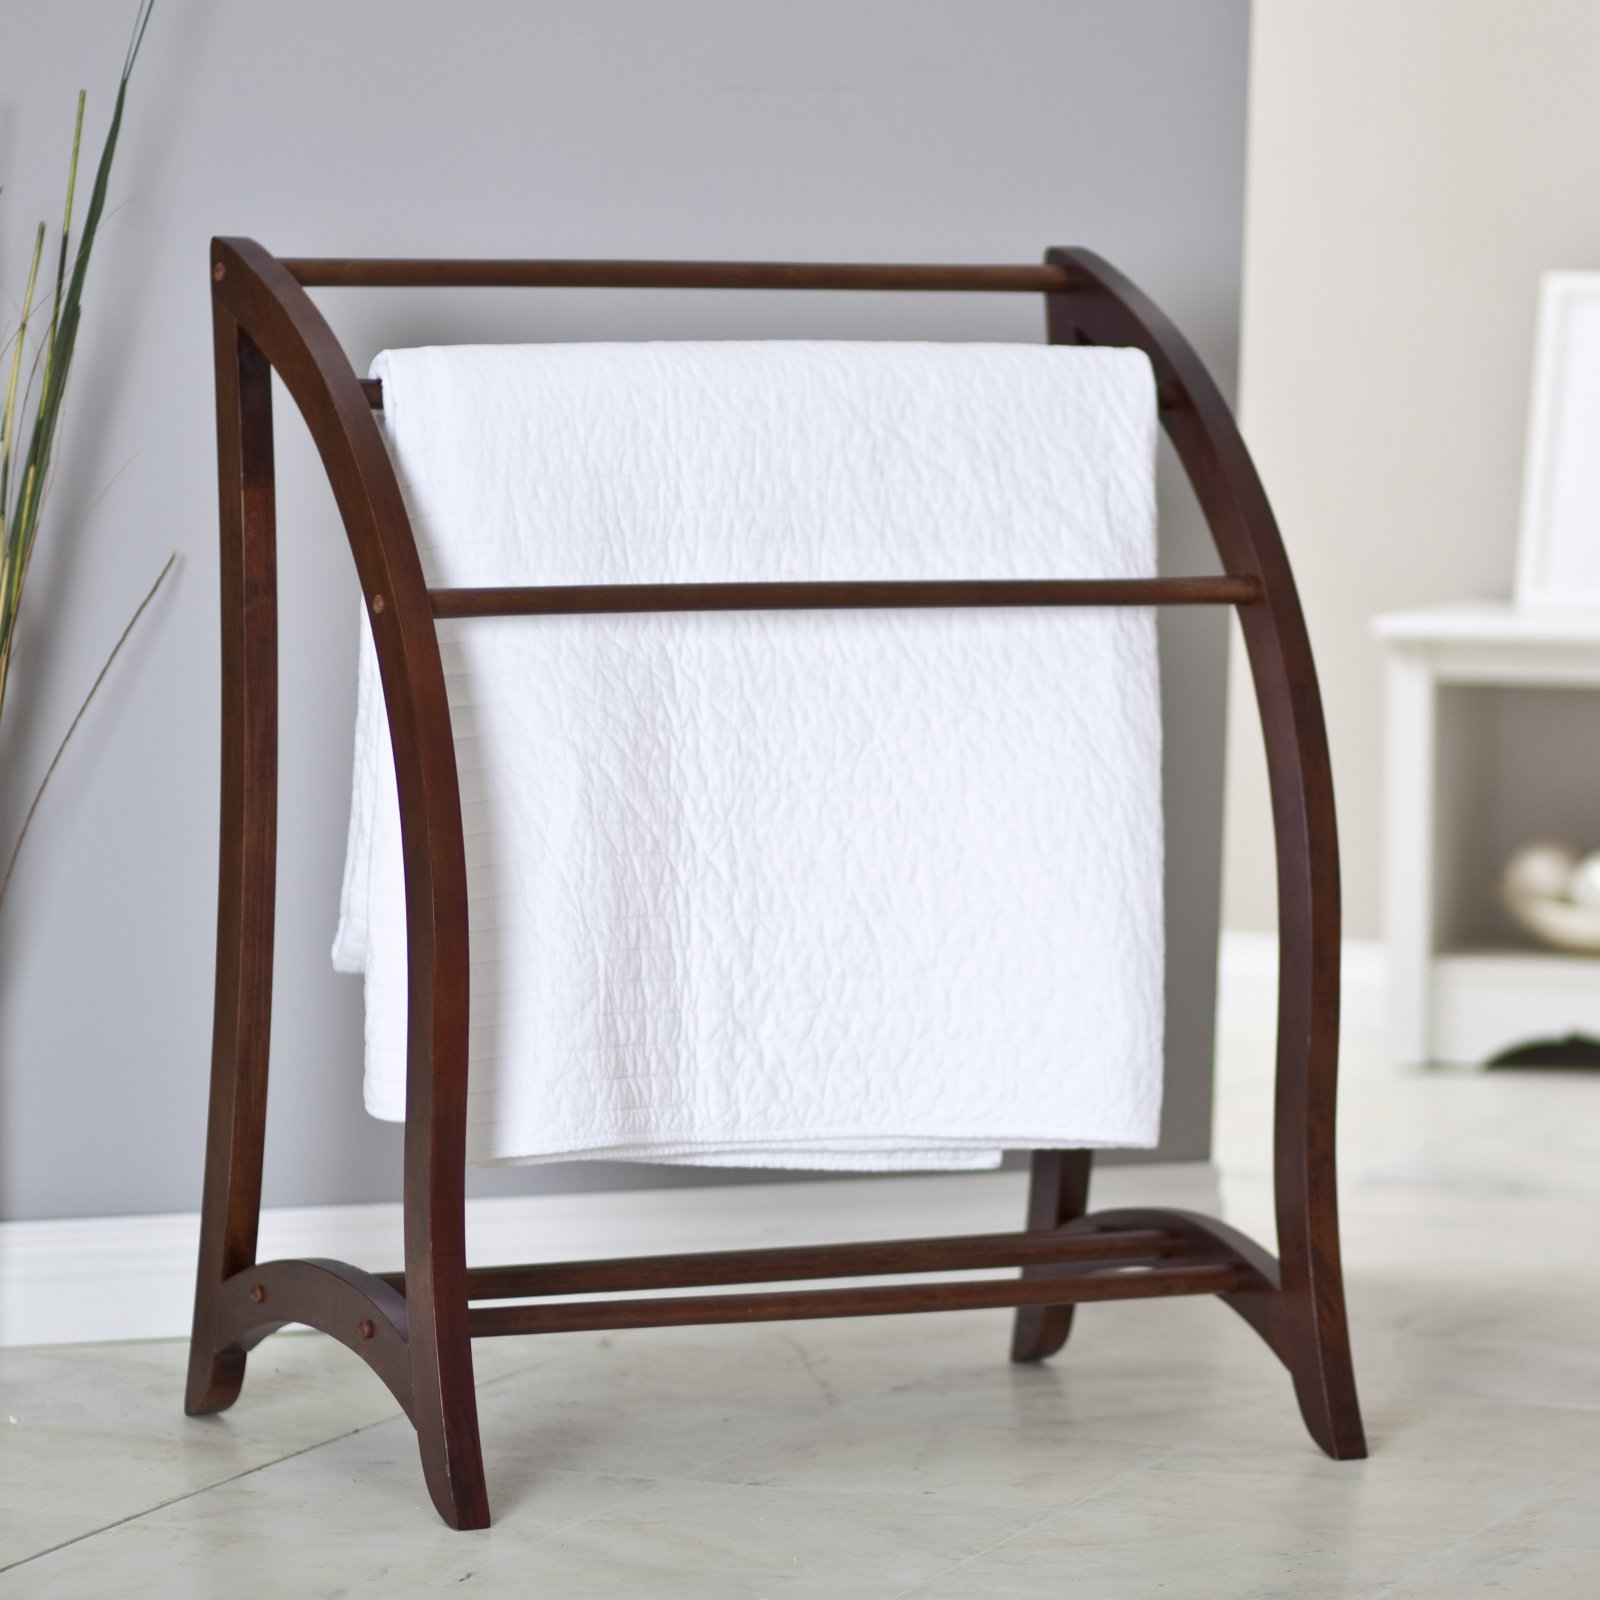 3 Rack Blanket/Towel Holder, Walnut